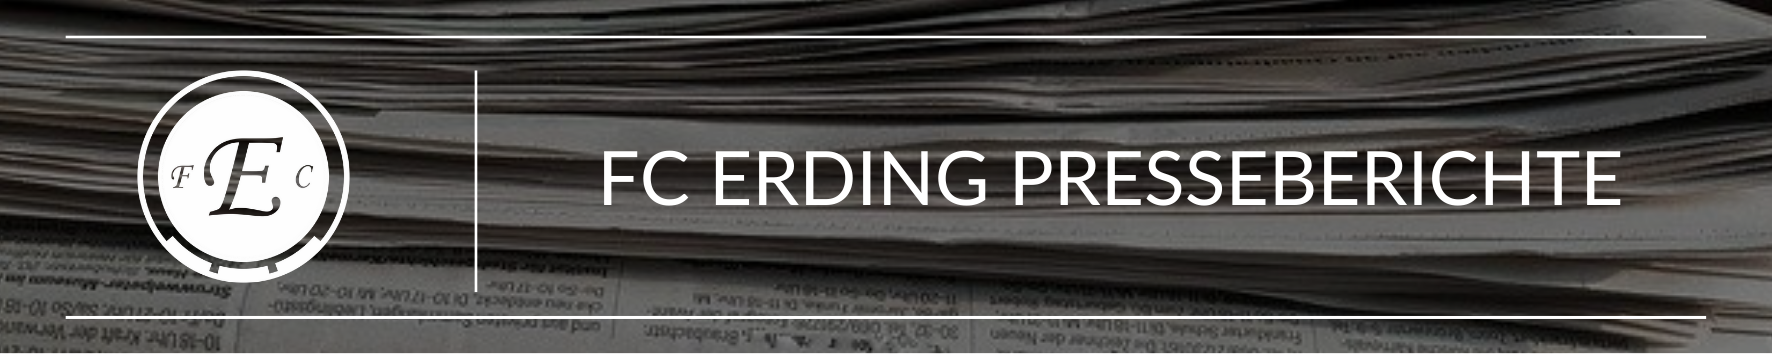 FC Erding Presseberichte